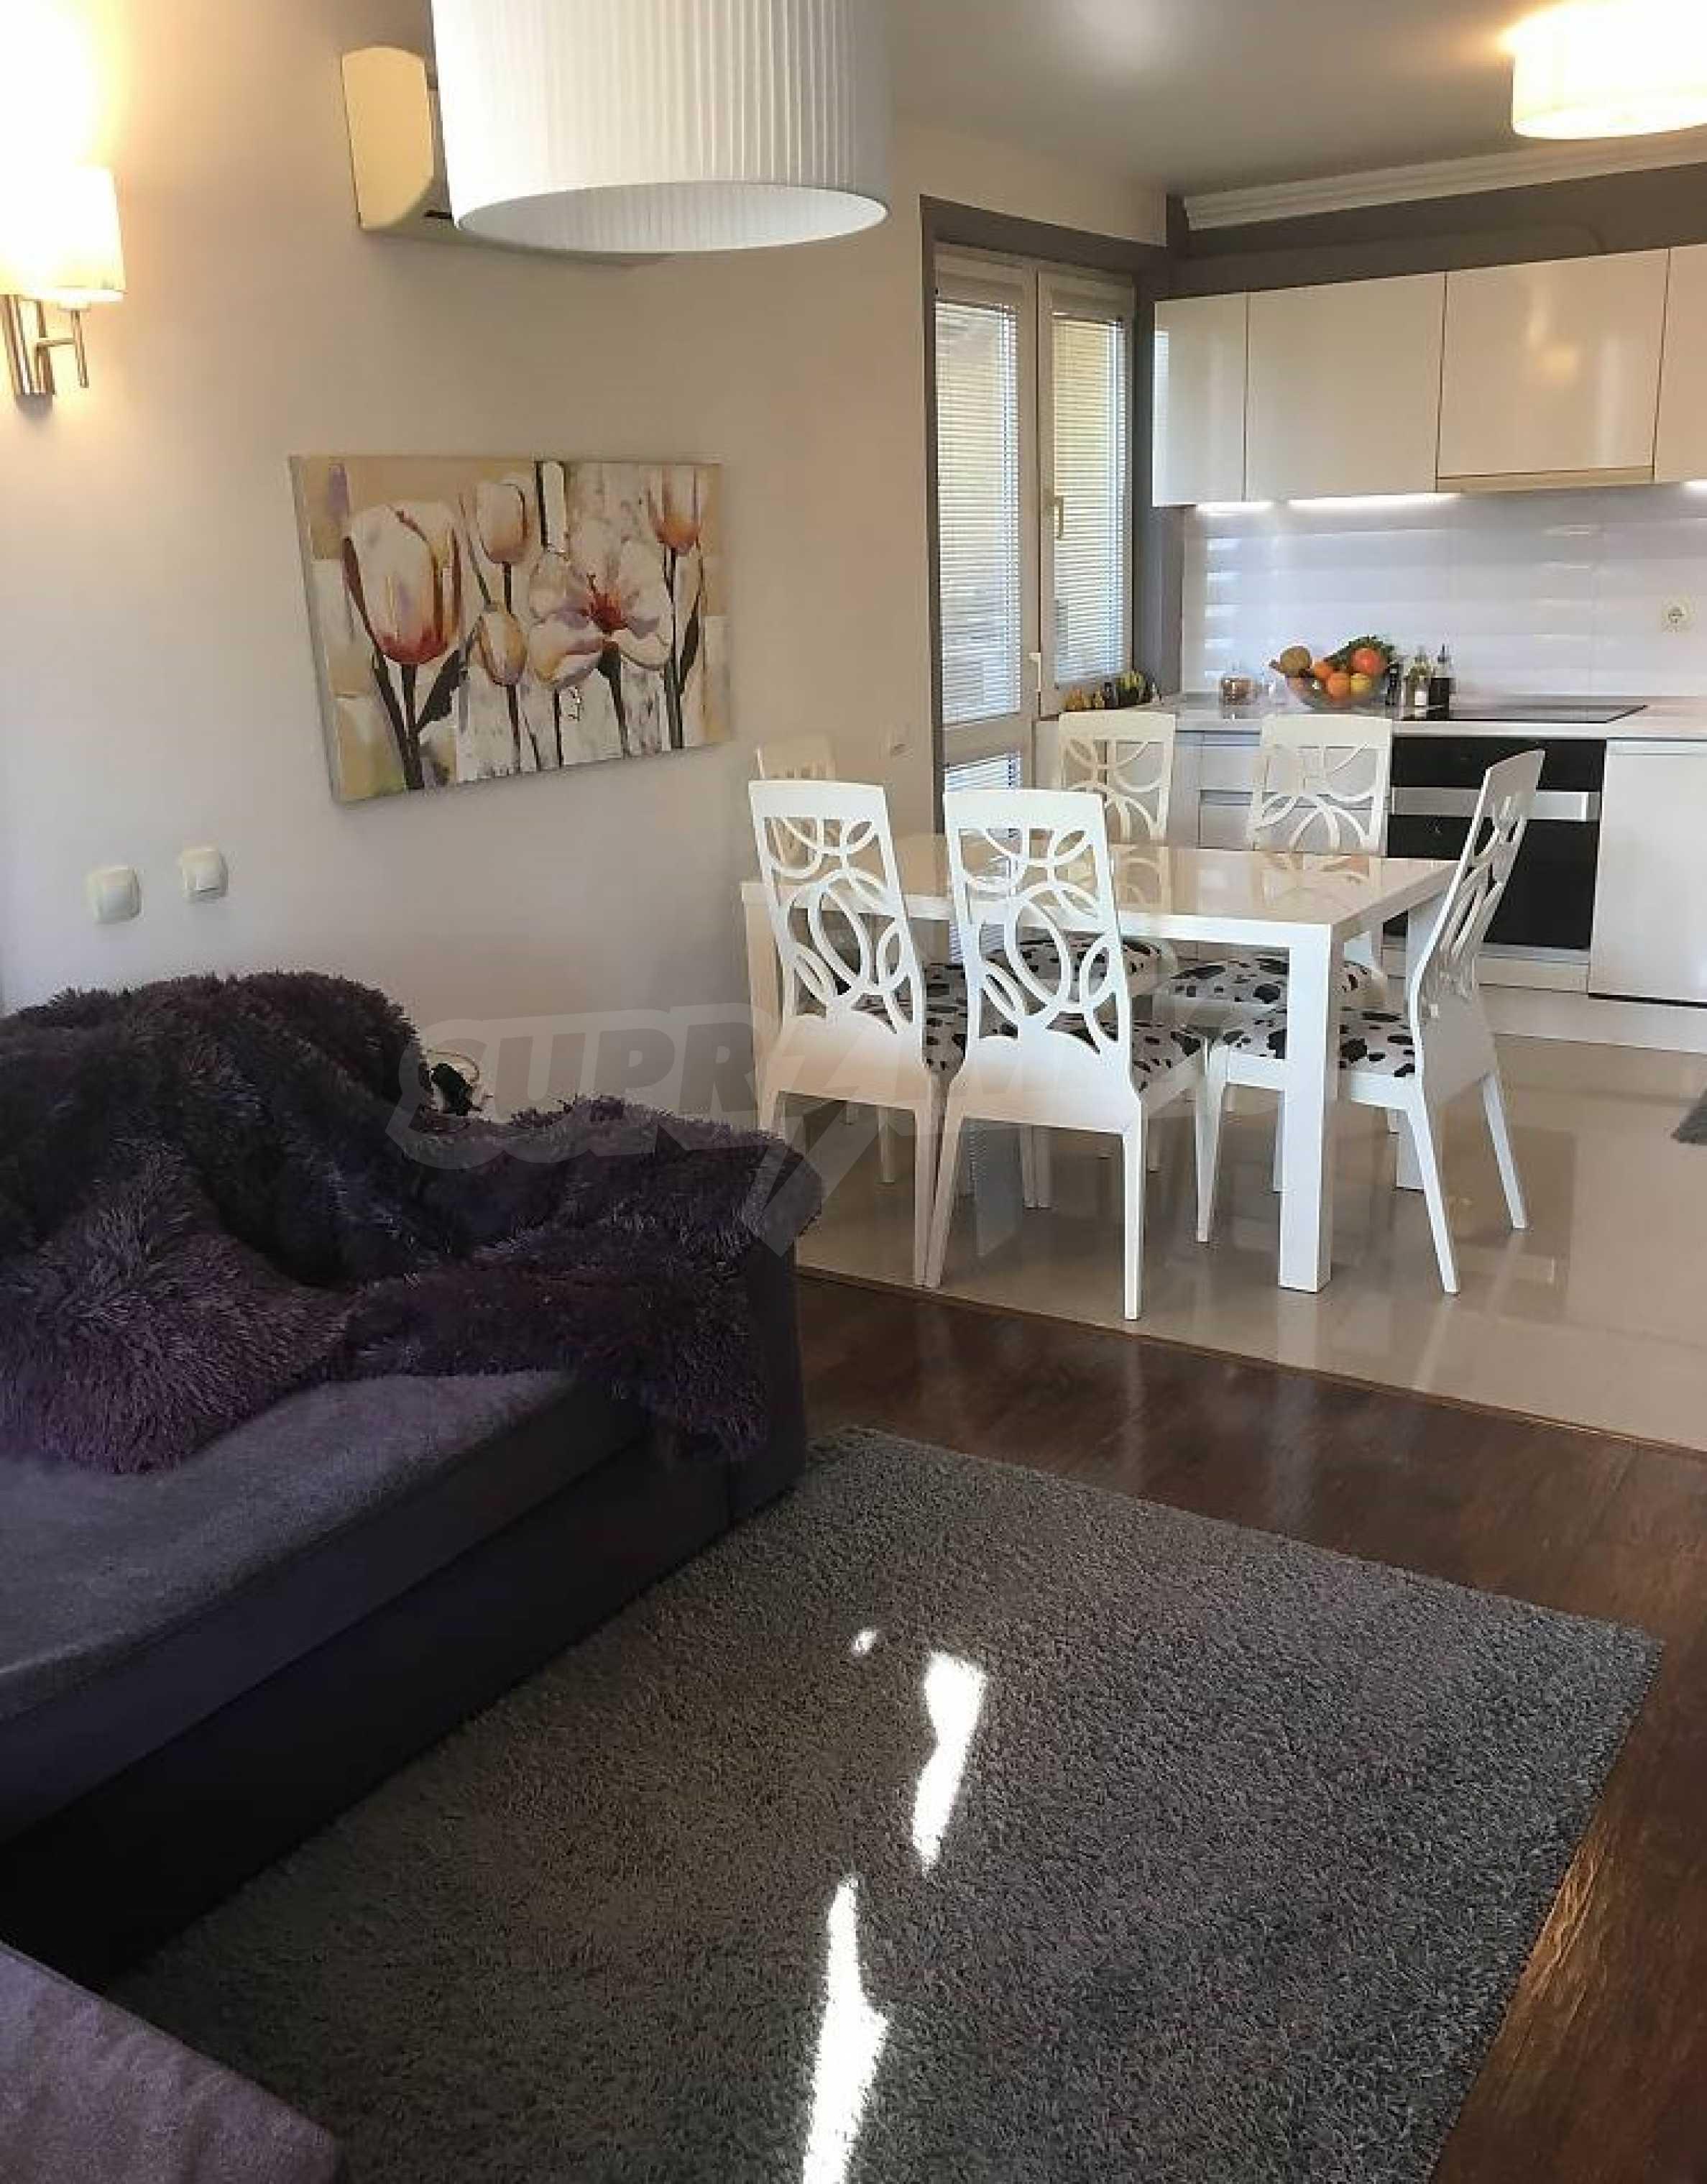 1-bedroom apartment for sale in Burgas, Bulgaria - Sales - 1-bedroom apartment.